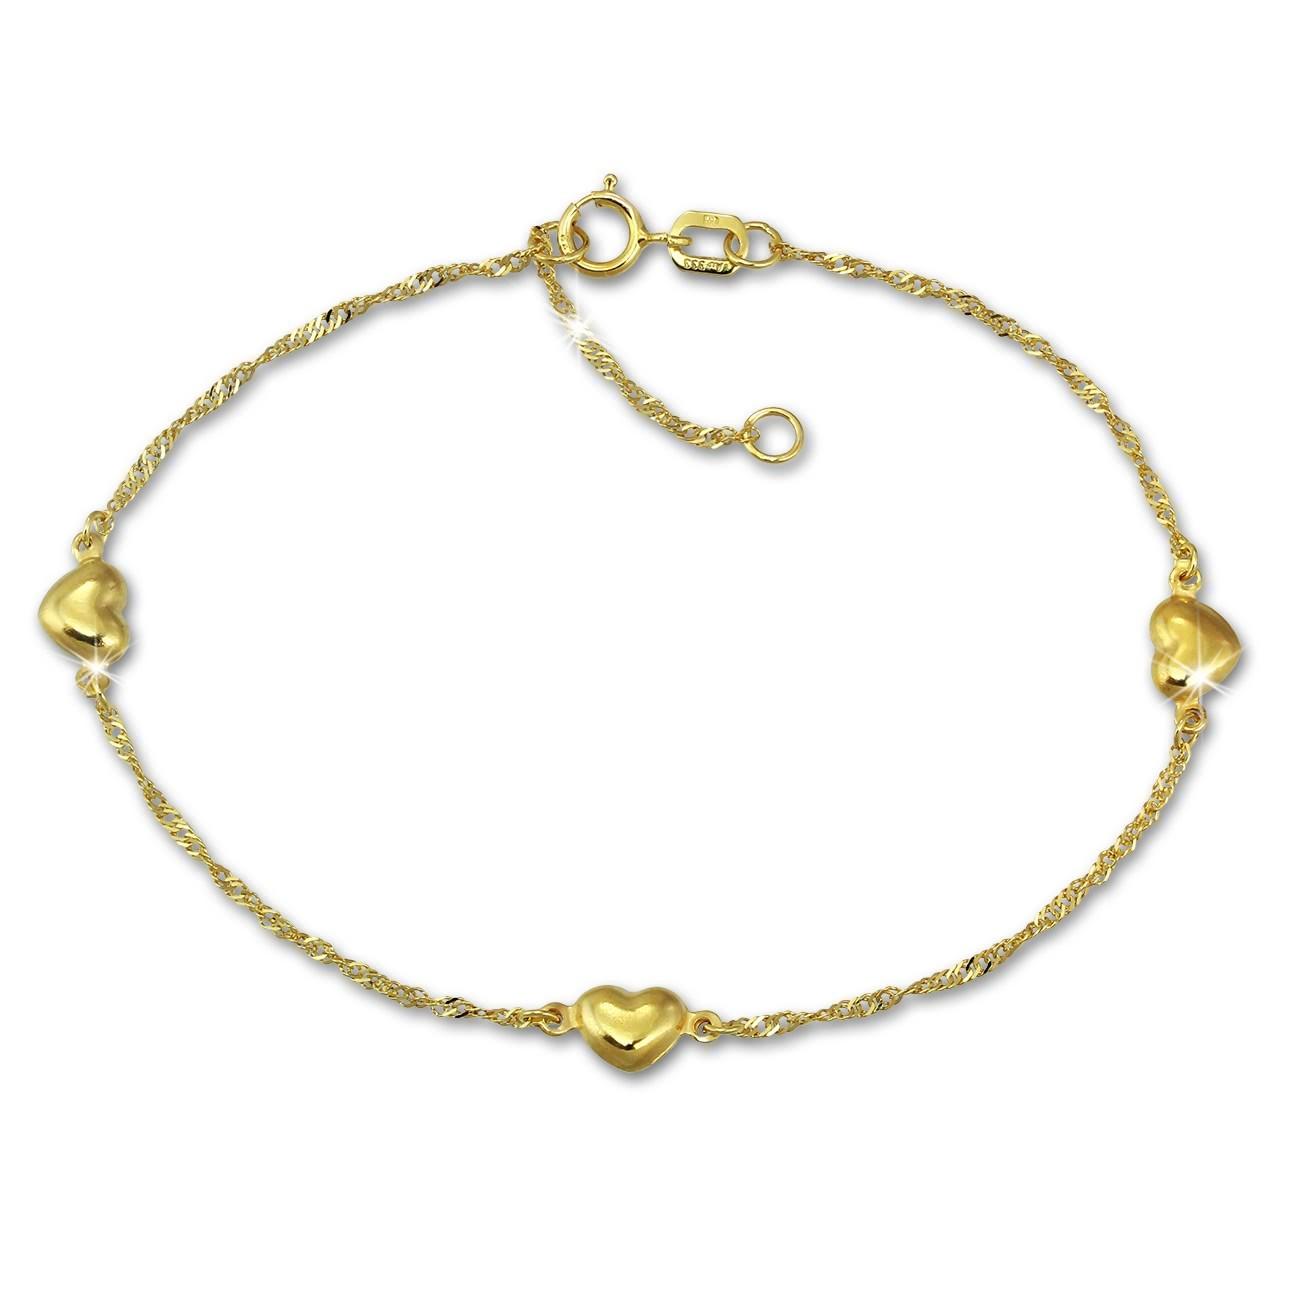 GoldDream Armband Singapur Herz diamantiert 333 Gold 19cm 8 Karat GDA0309Y